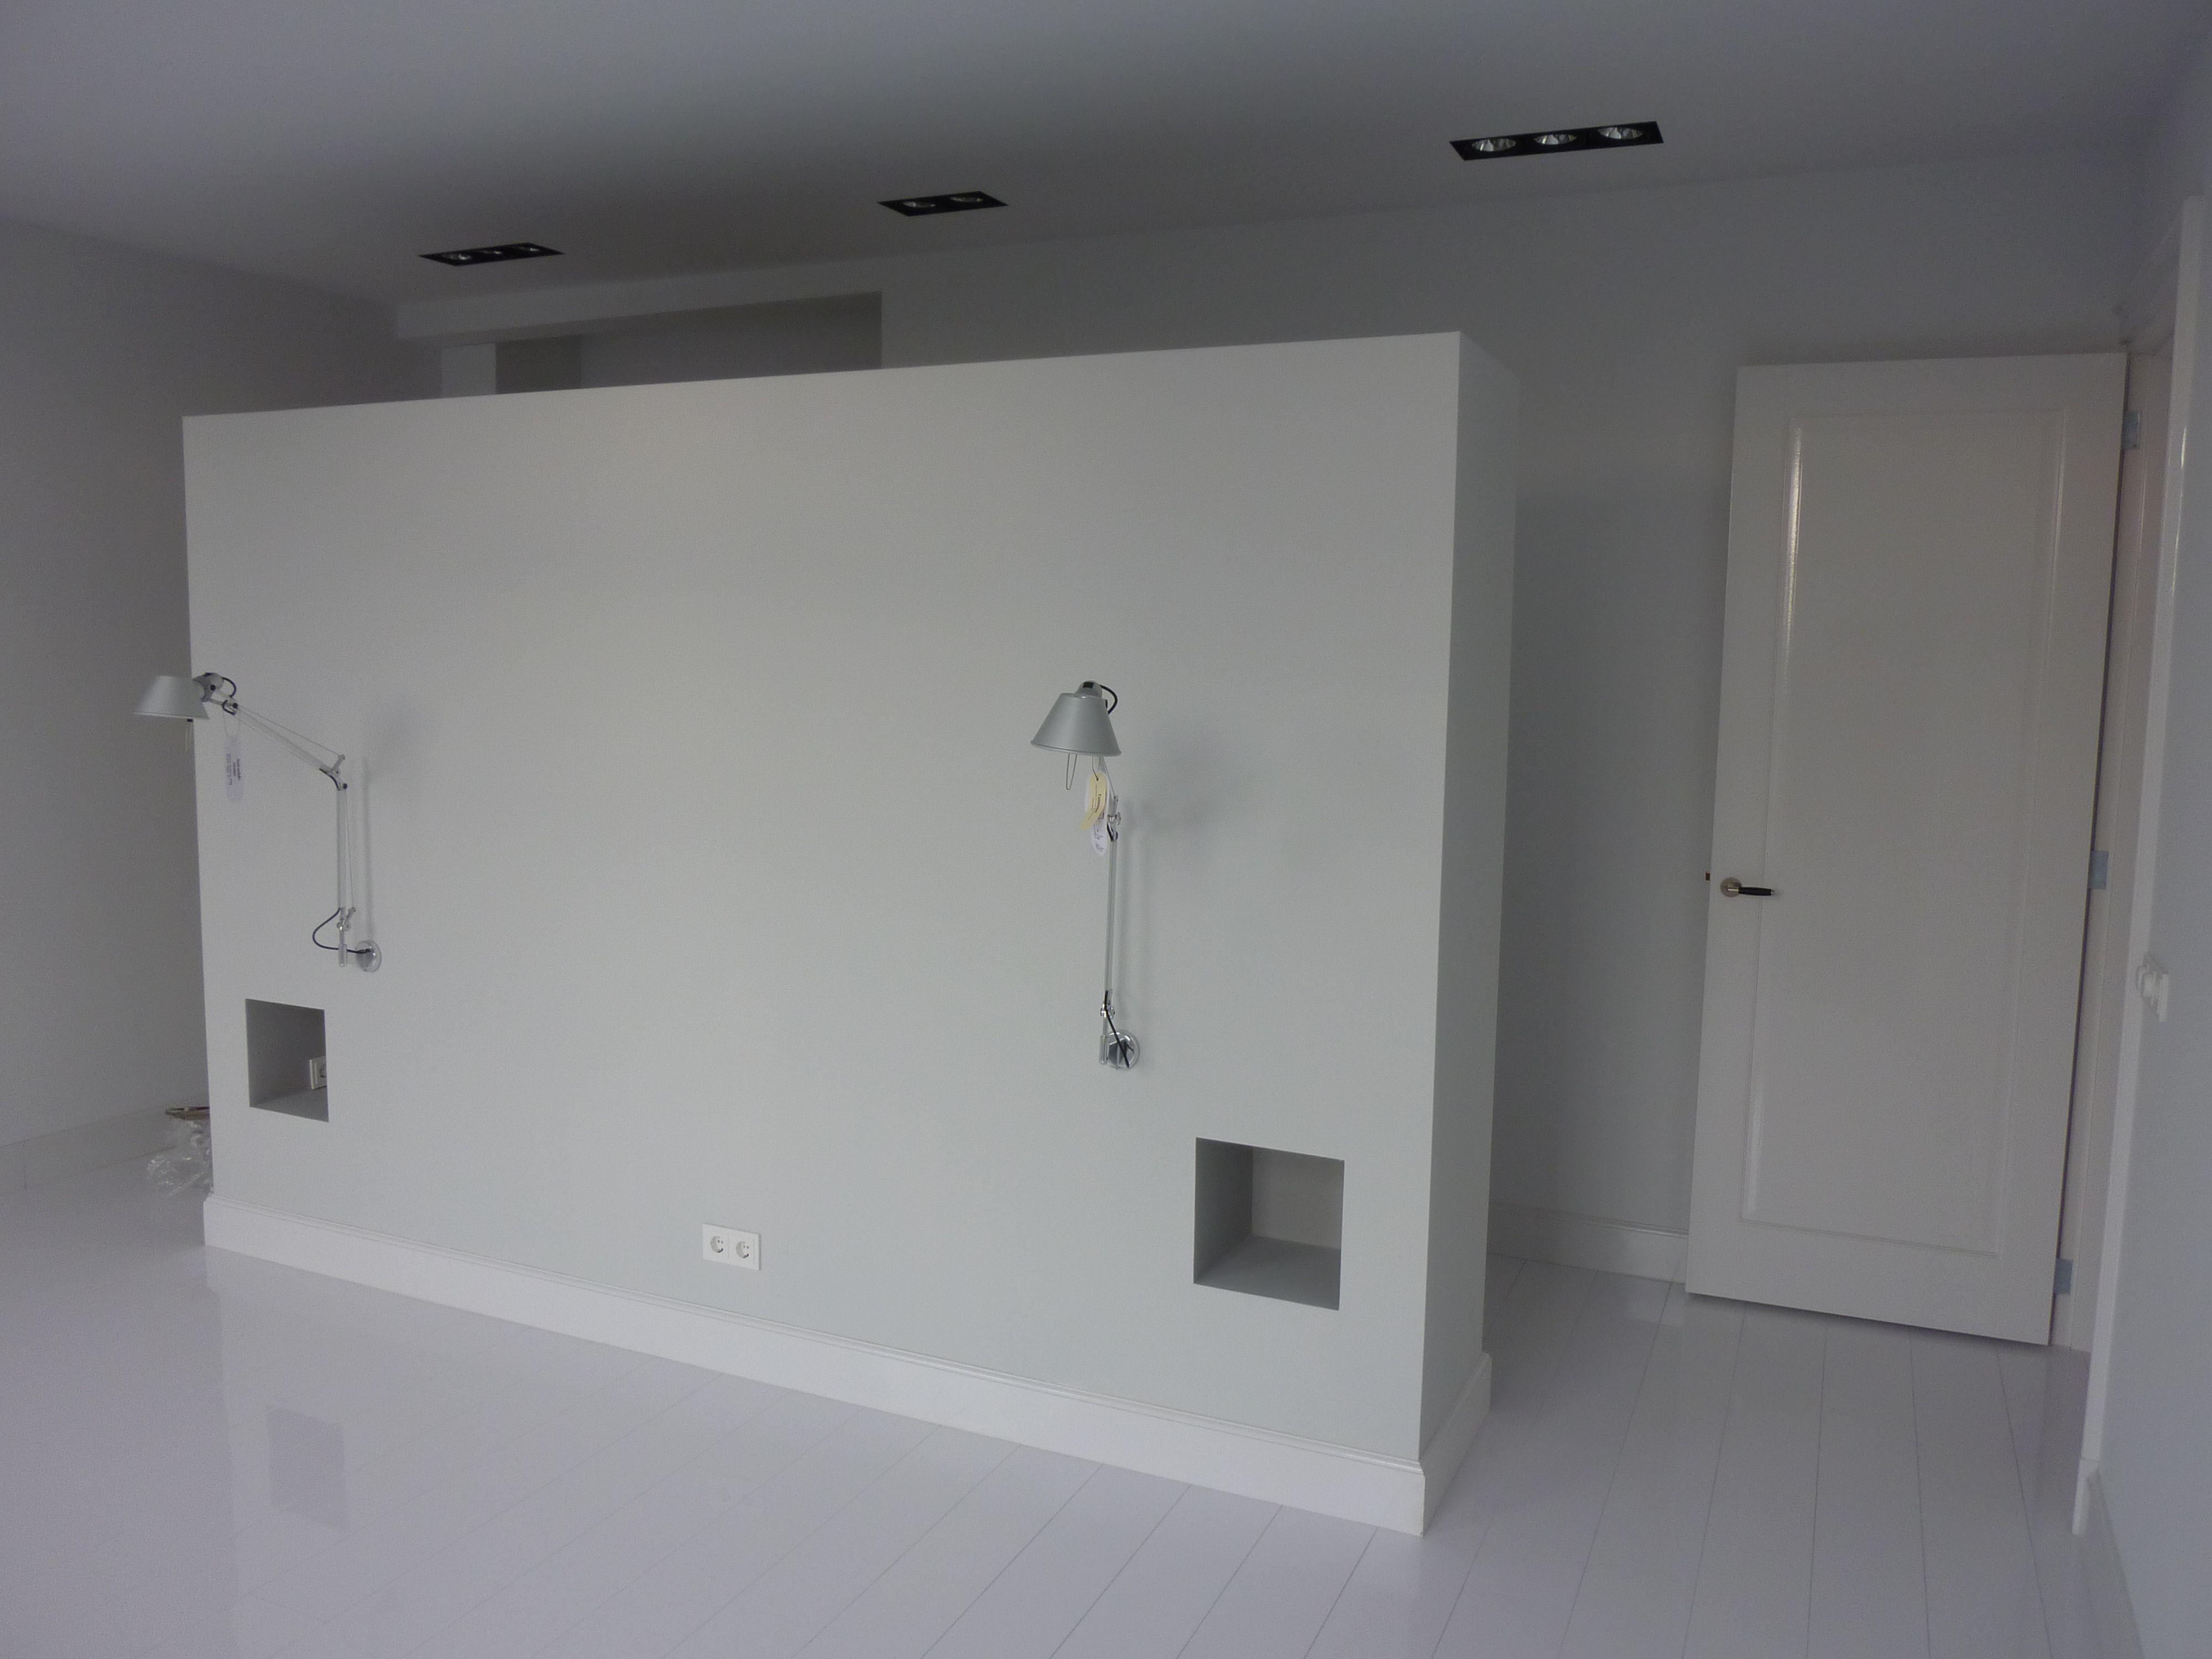 Interieur slaapkamer garderobewand met nachtkast nissen project